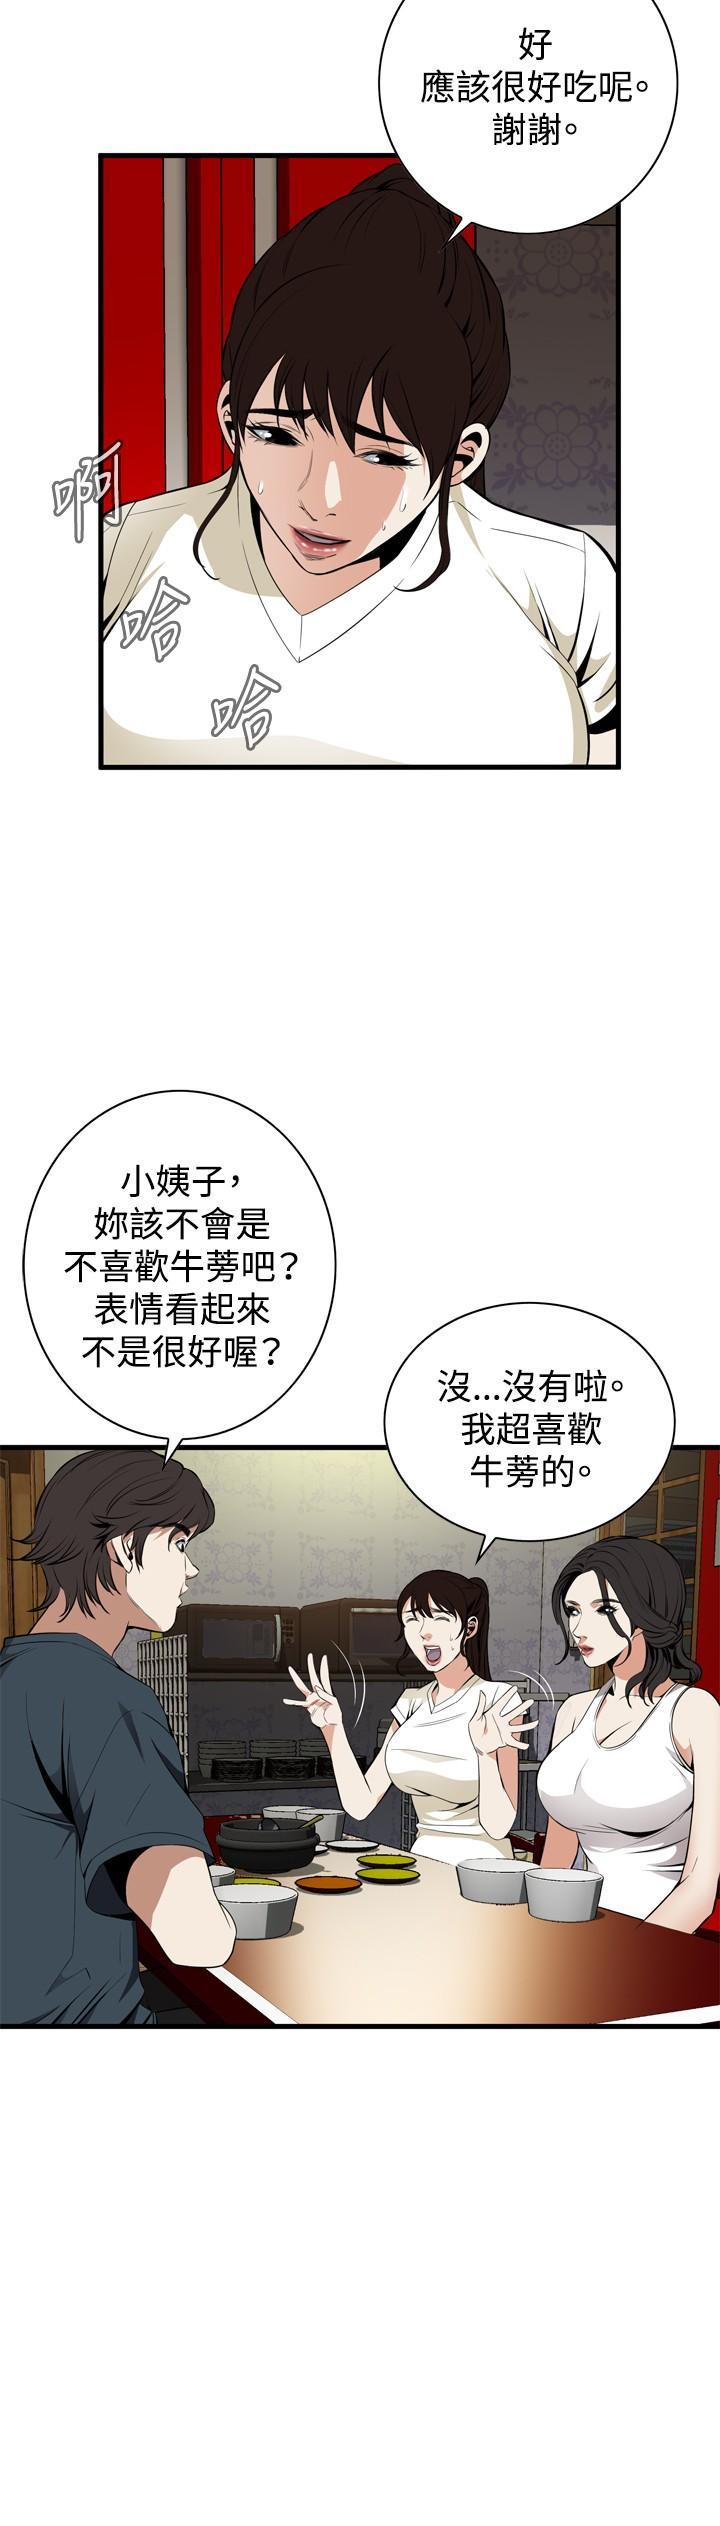 Take a Peek 偷窥 Ch.39~55 [Chinese]中文 139